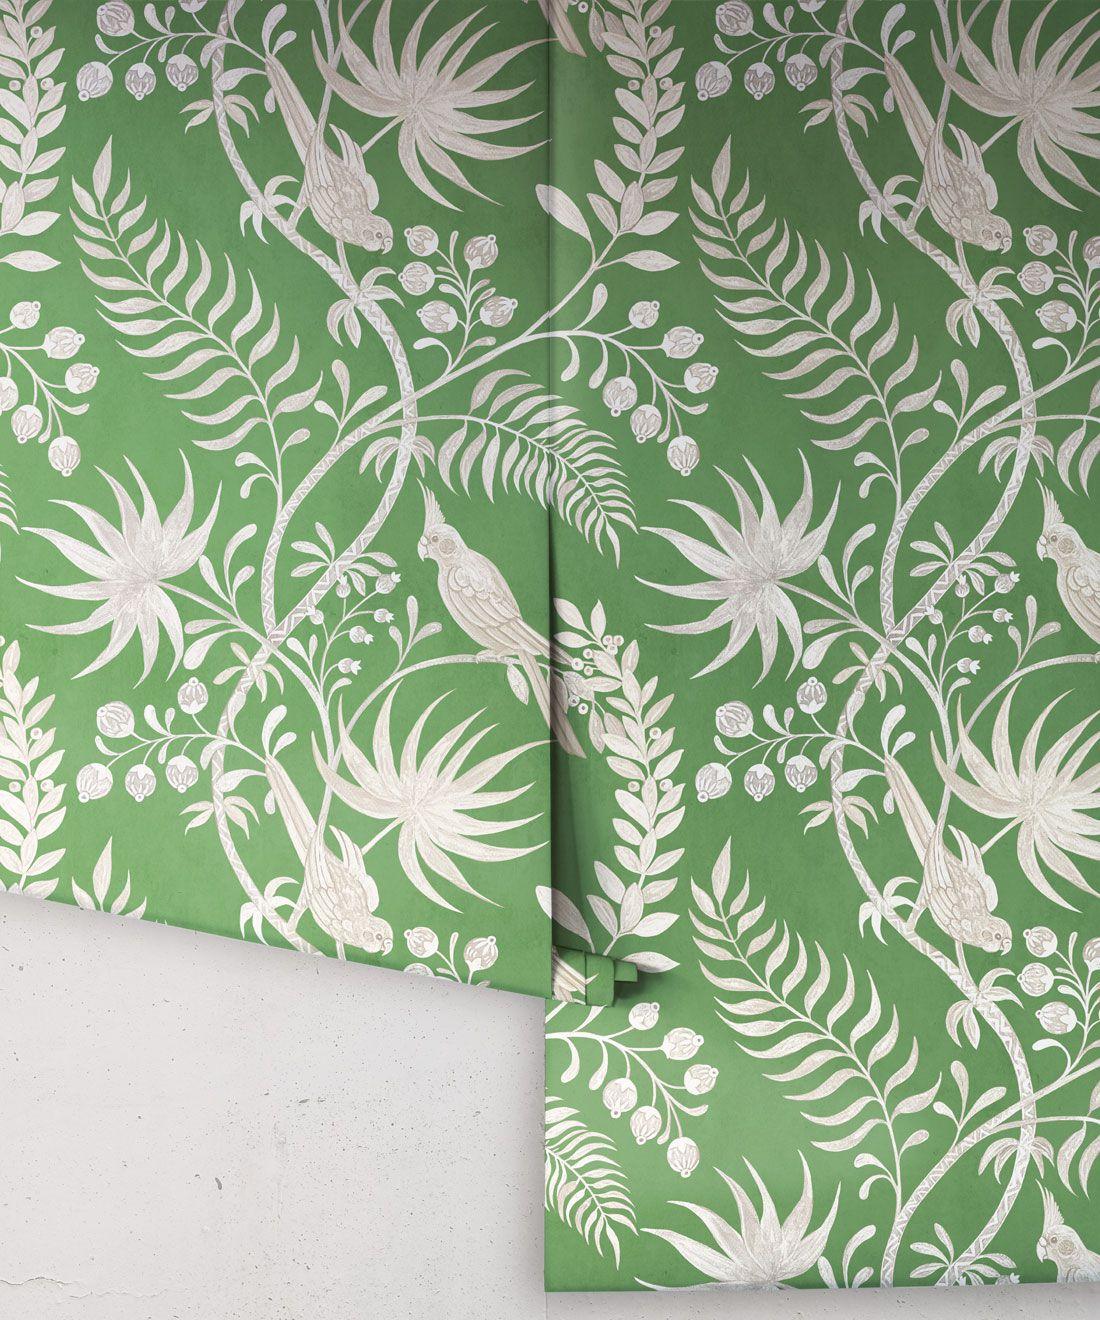 Tropicana Wallpaper • Fern Green • Rolls